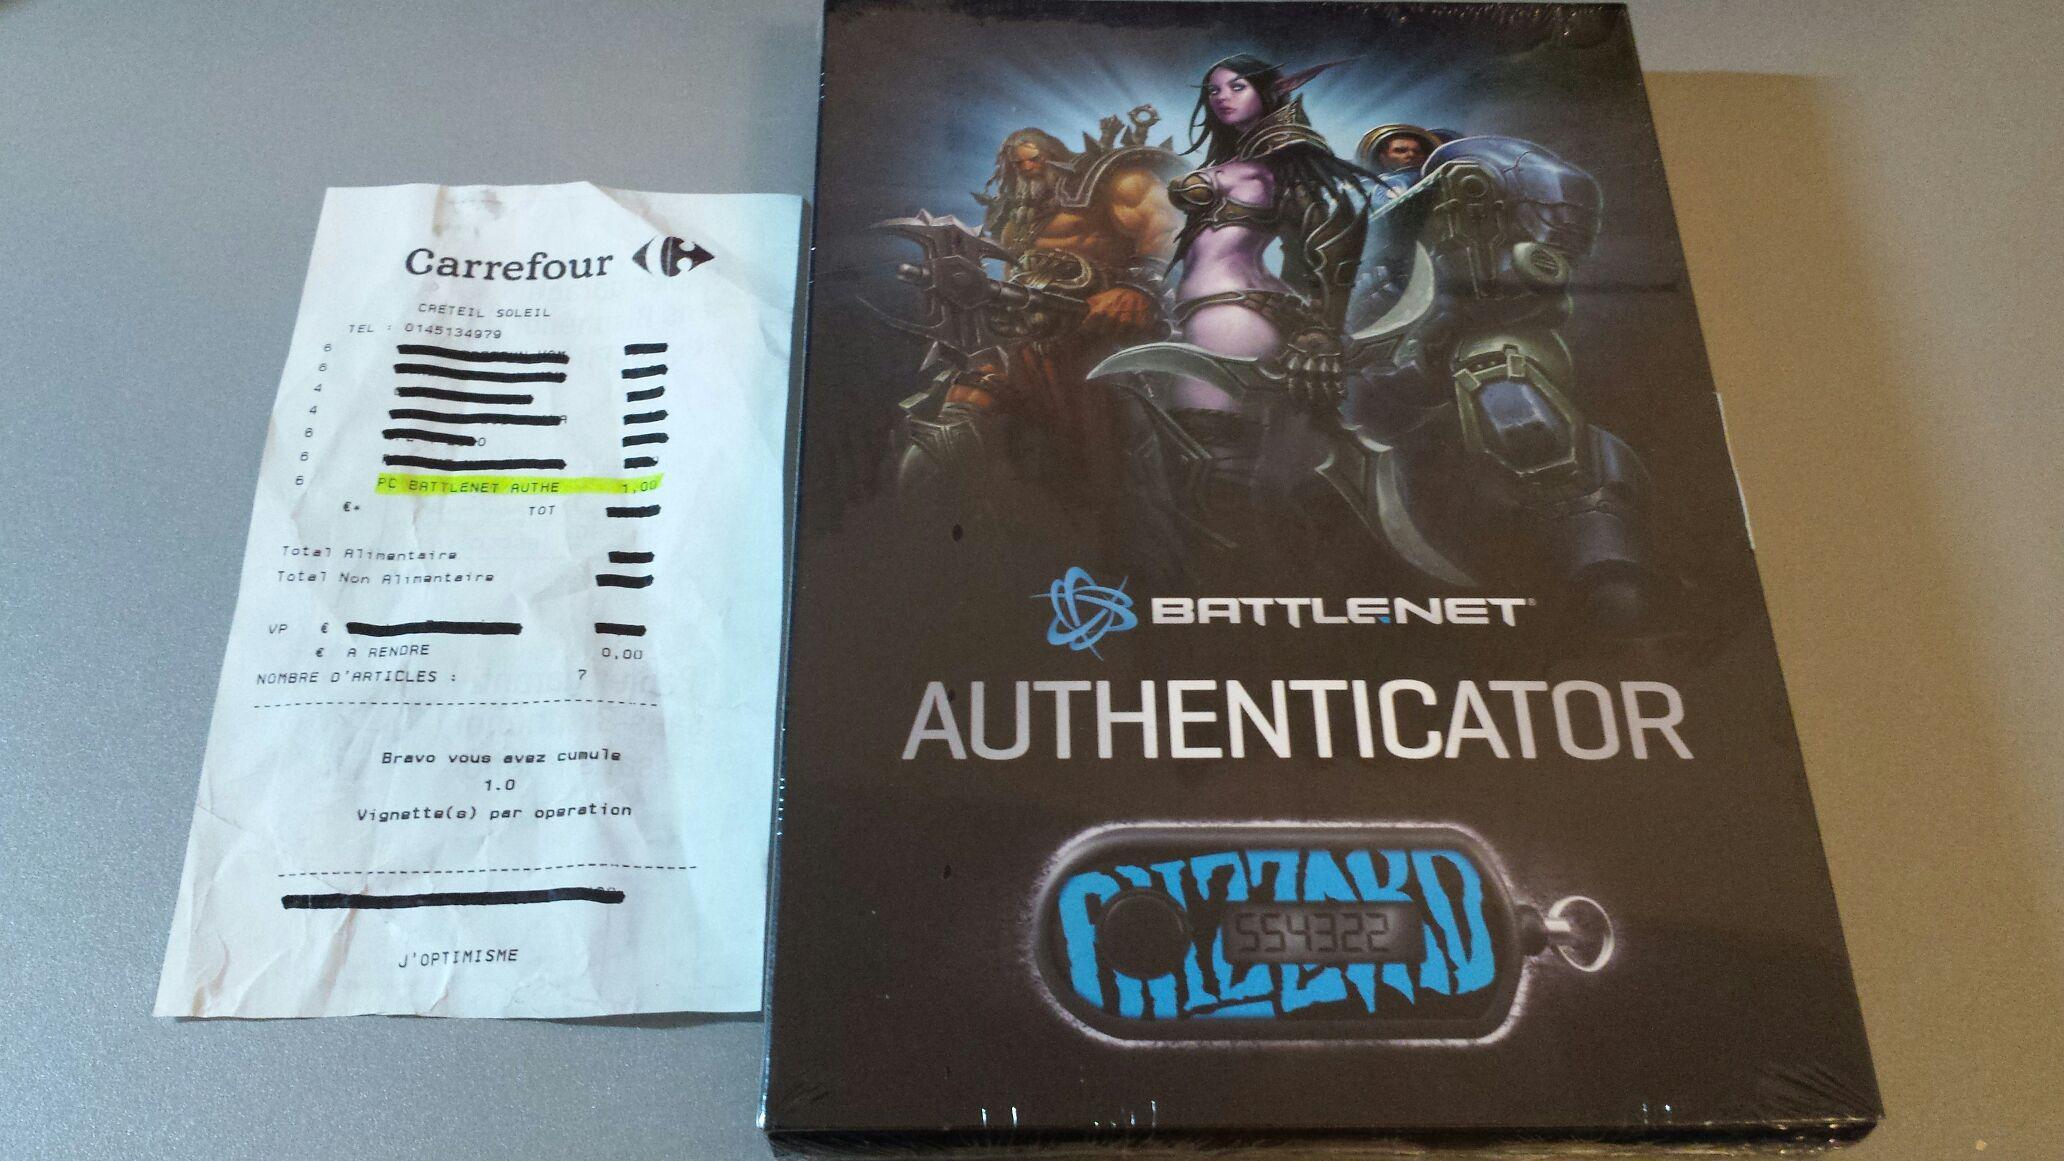 Authenticator Battle.net